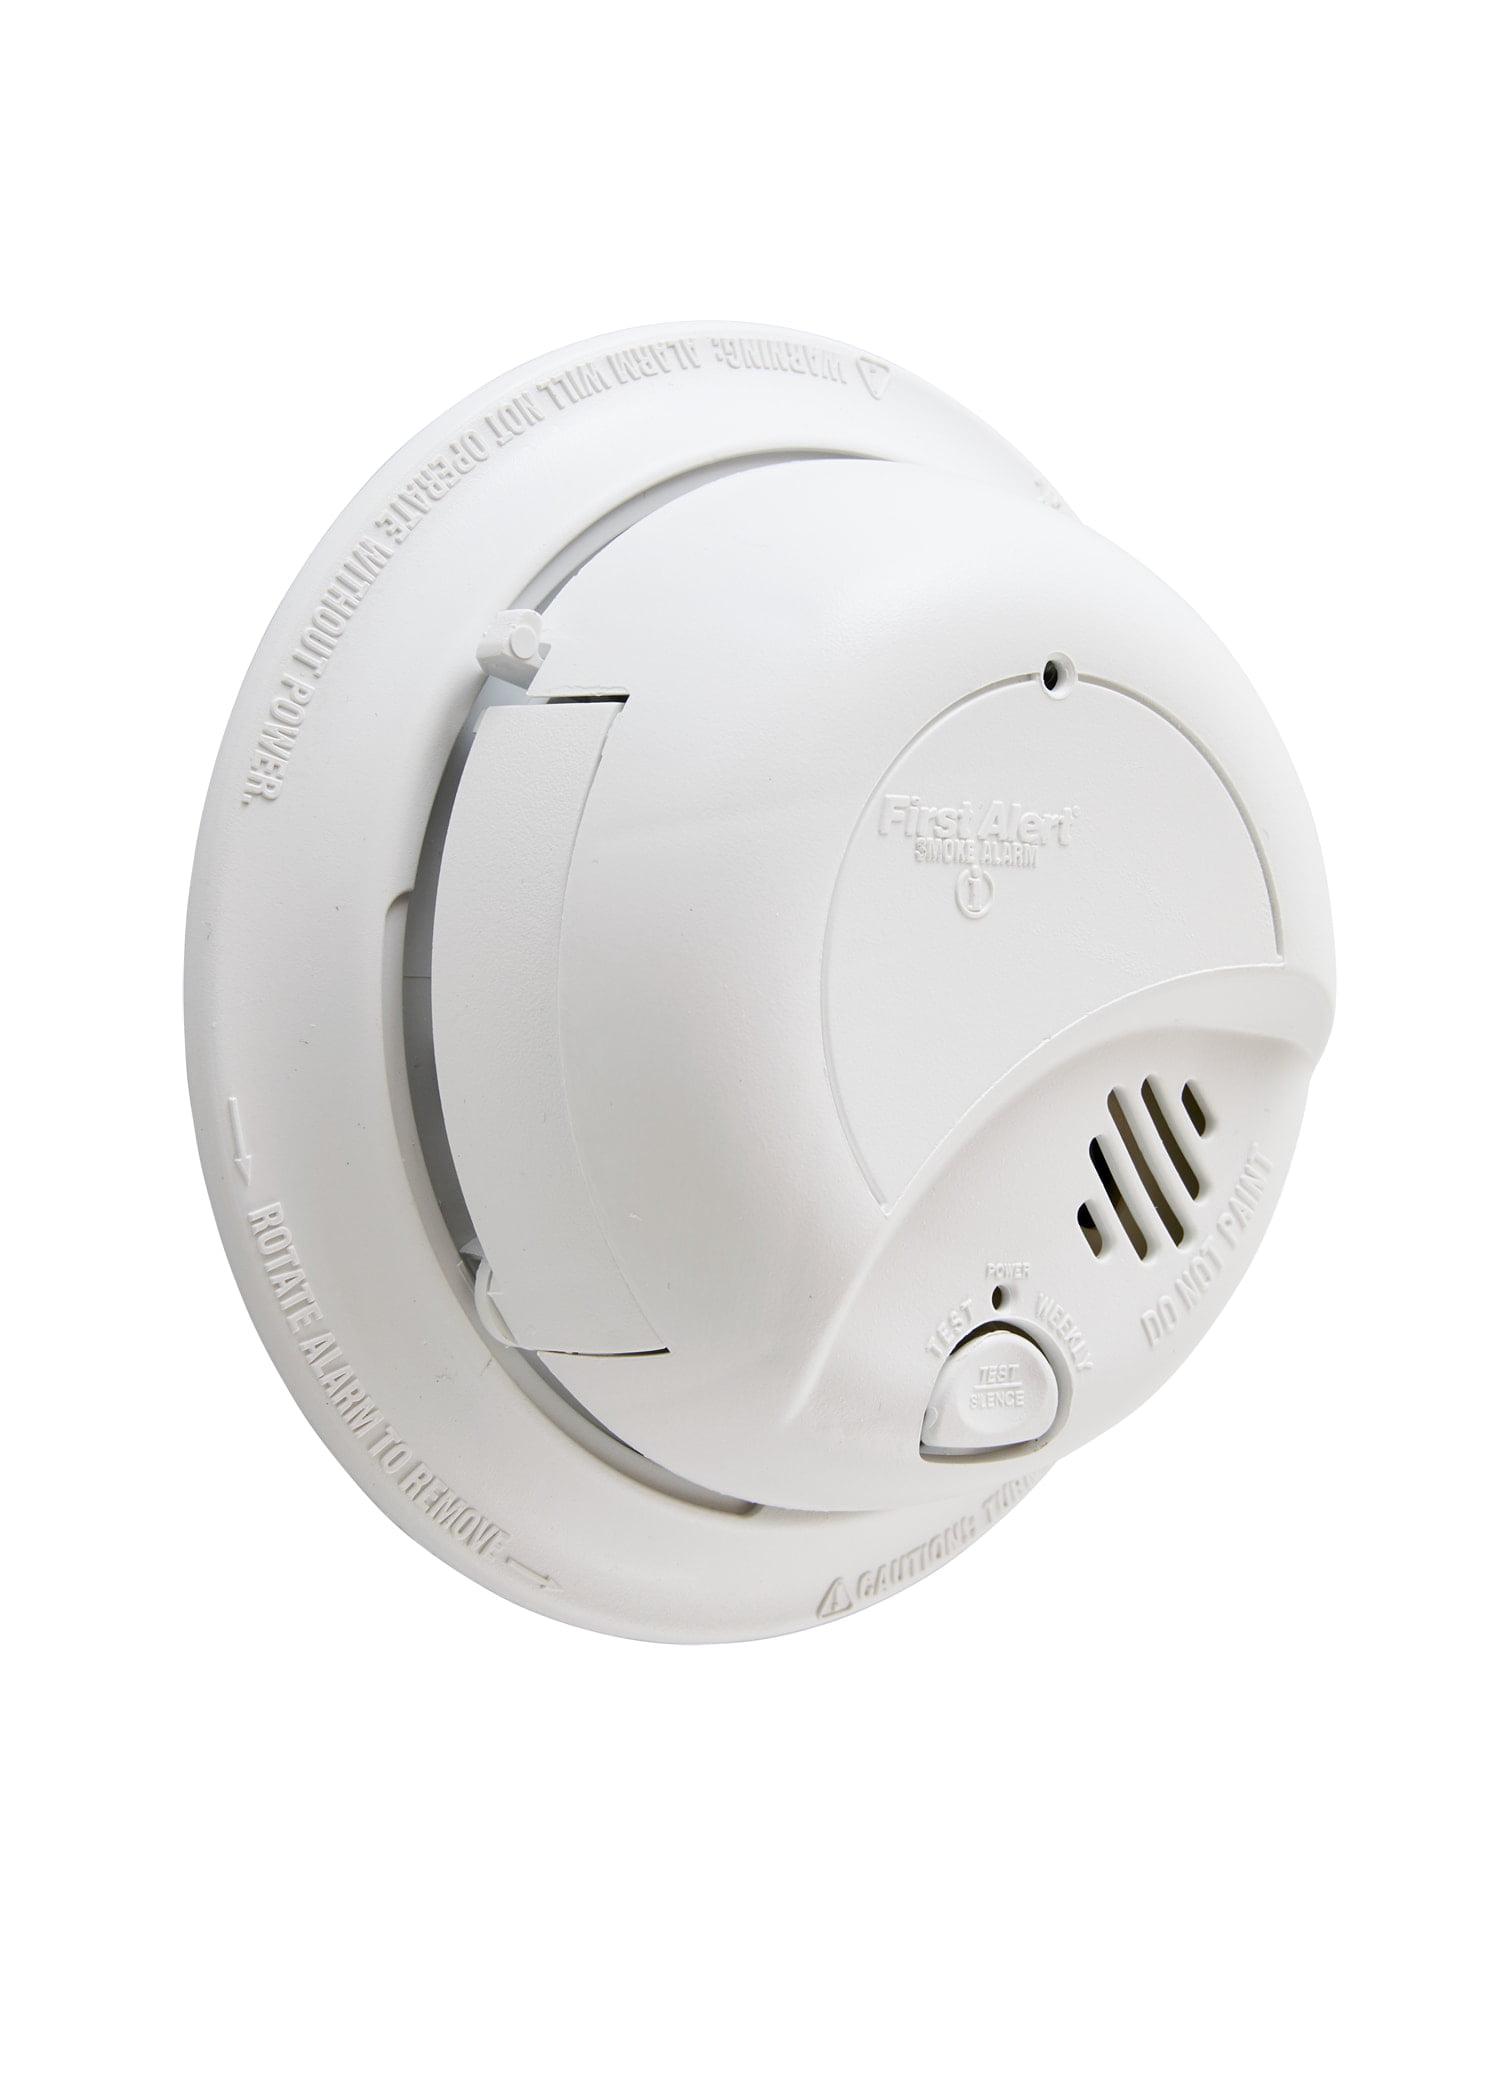 First Alert SA9120BPCN 120V AC Hardwired Smoke Alarm with Adapter ...